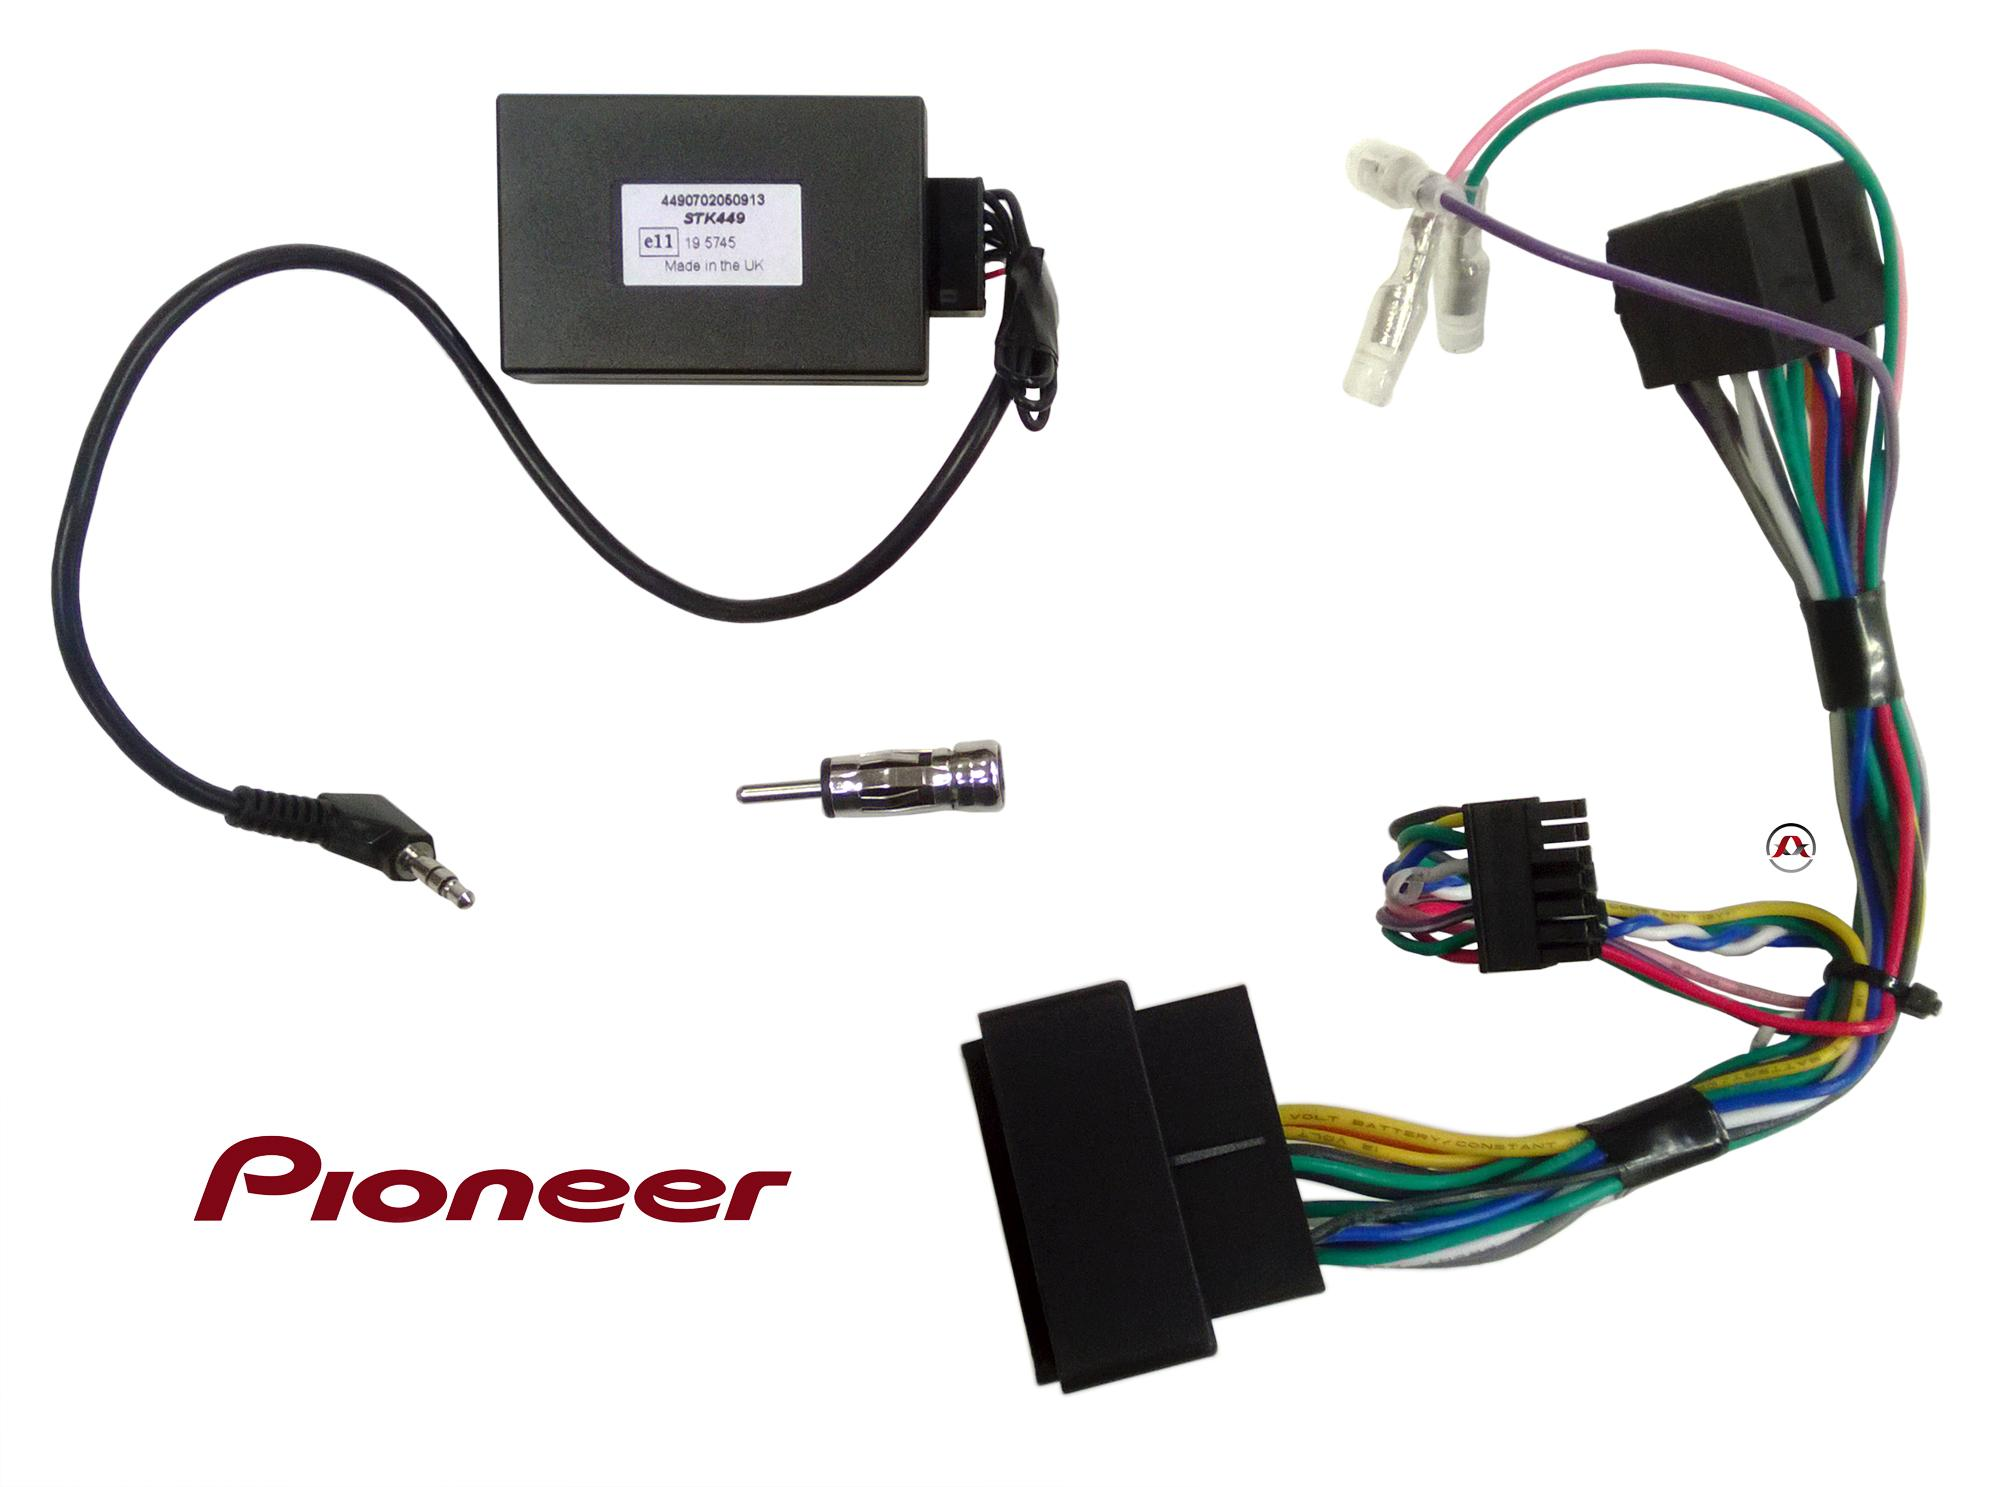 Cav pioneer pioneer ca r for 962ae interface commande au volant